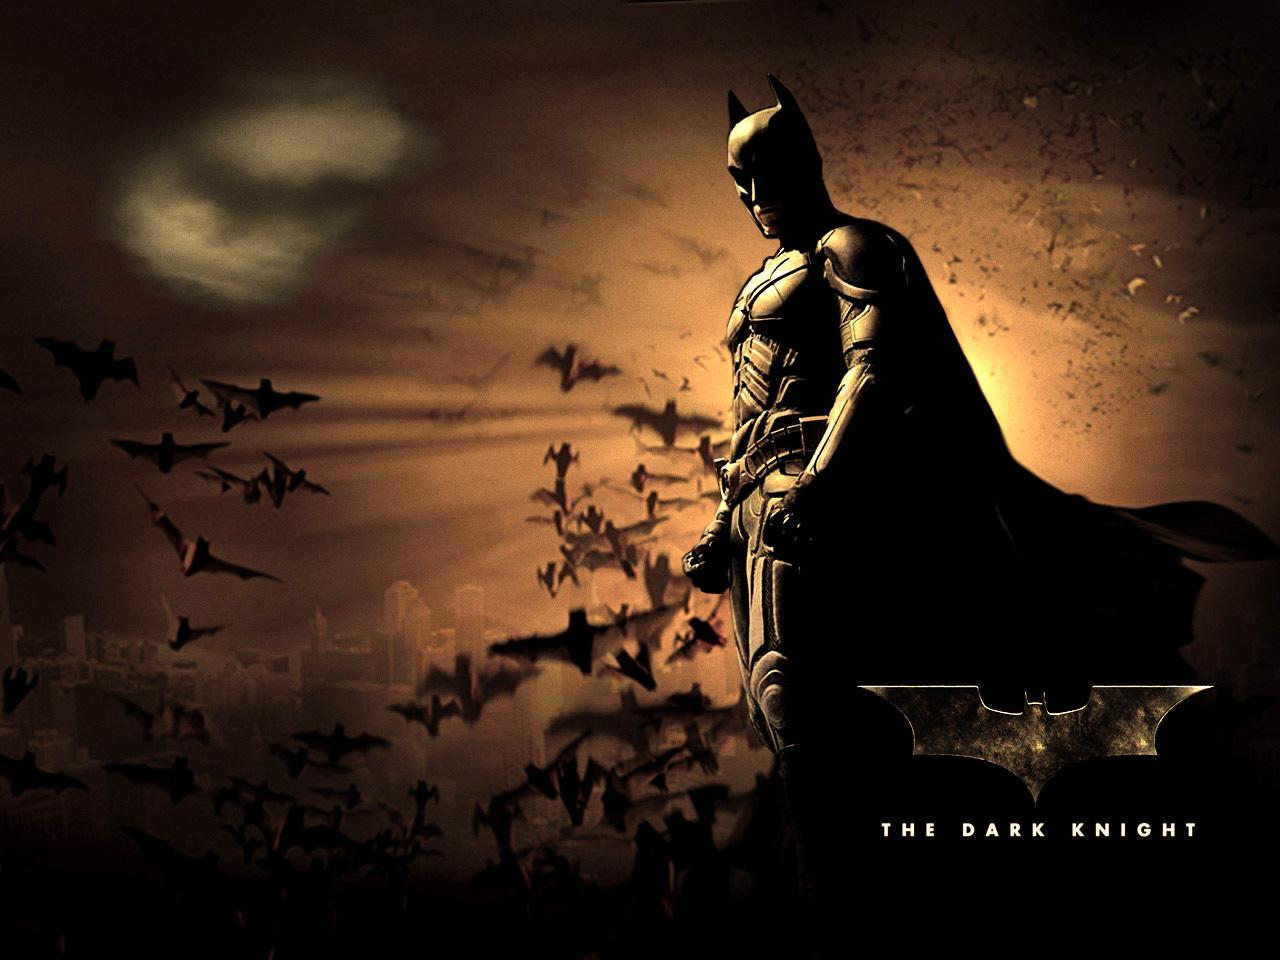 batman begins images batman hd wallpaper and background photos (8851510)